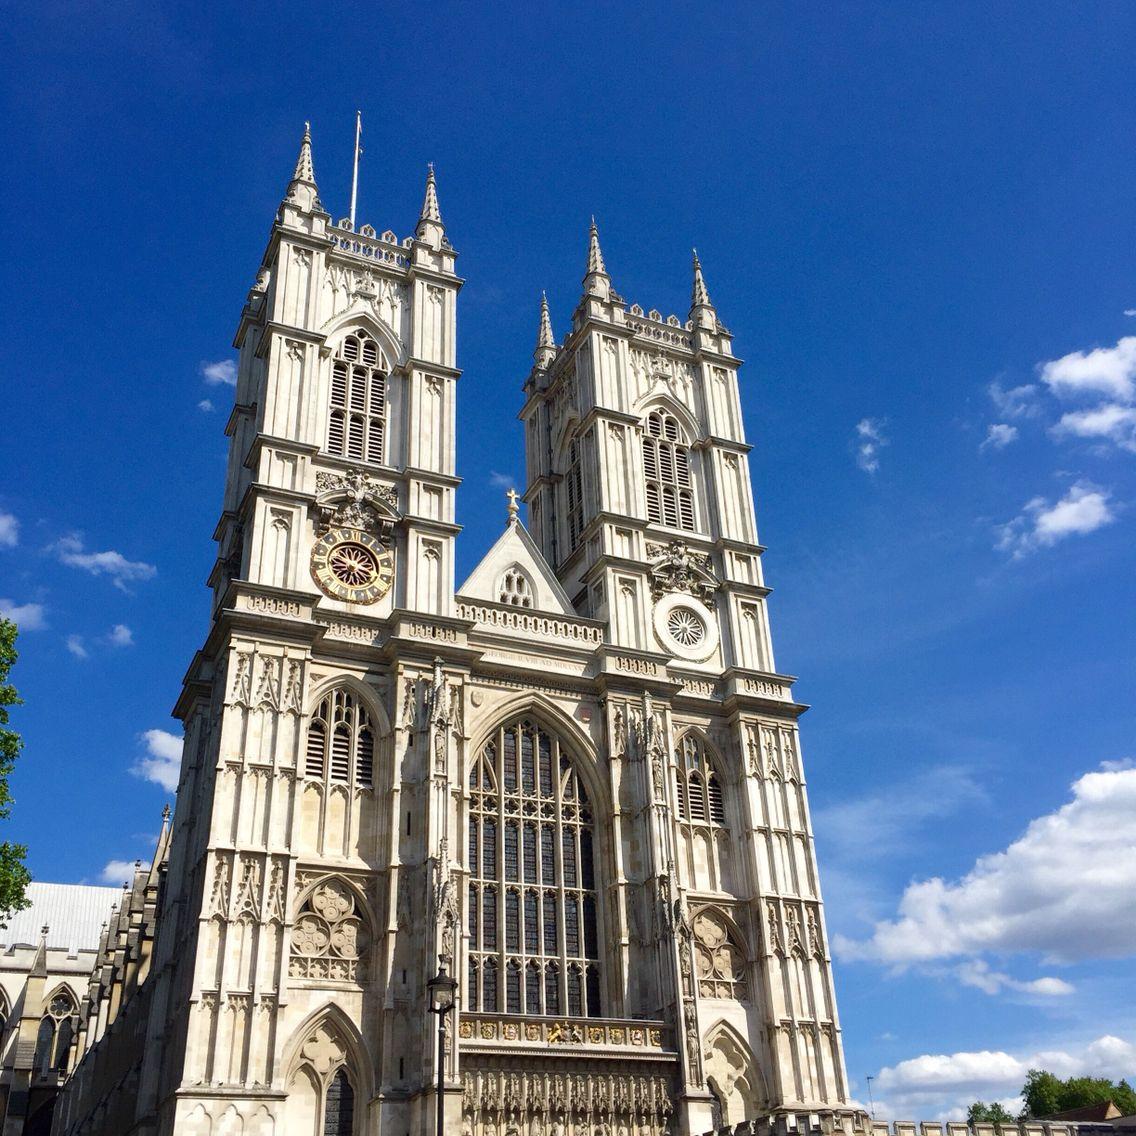 #WestminsterAbbey #London #travel #Sunday